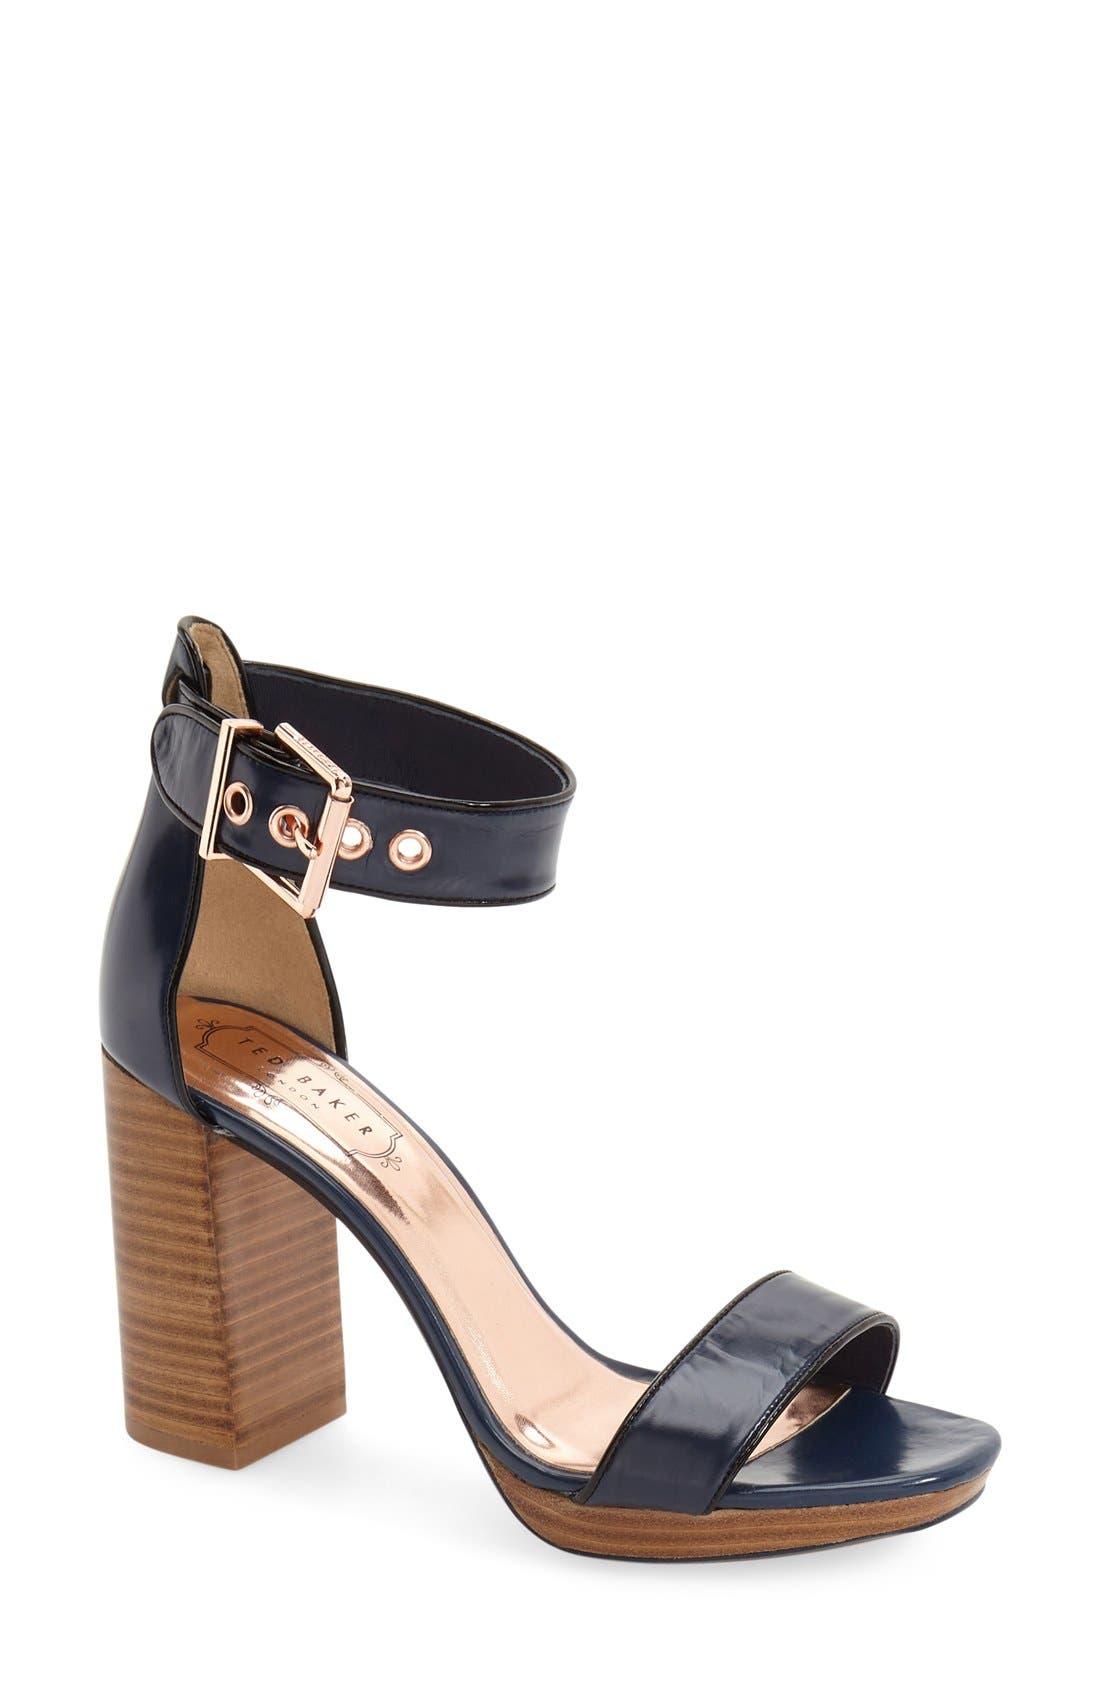 Main Image - Ted Baker London 'Lorno' Sandal (Women)